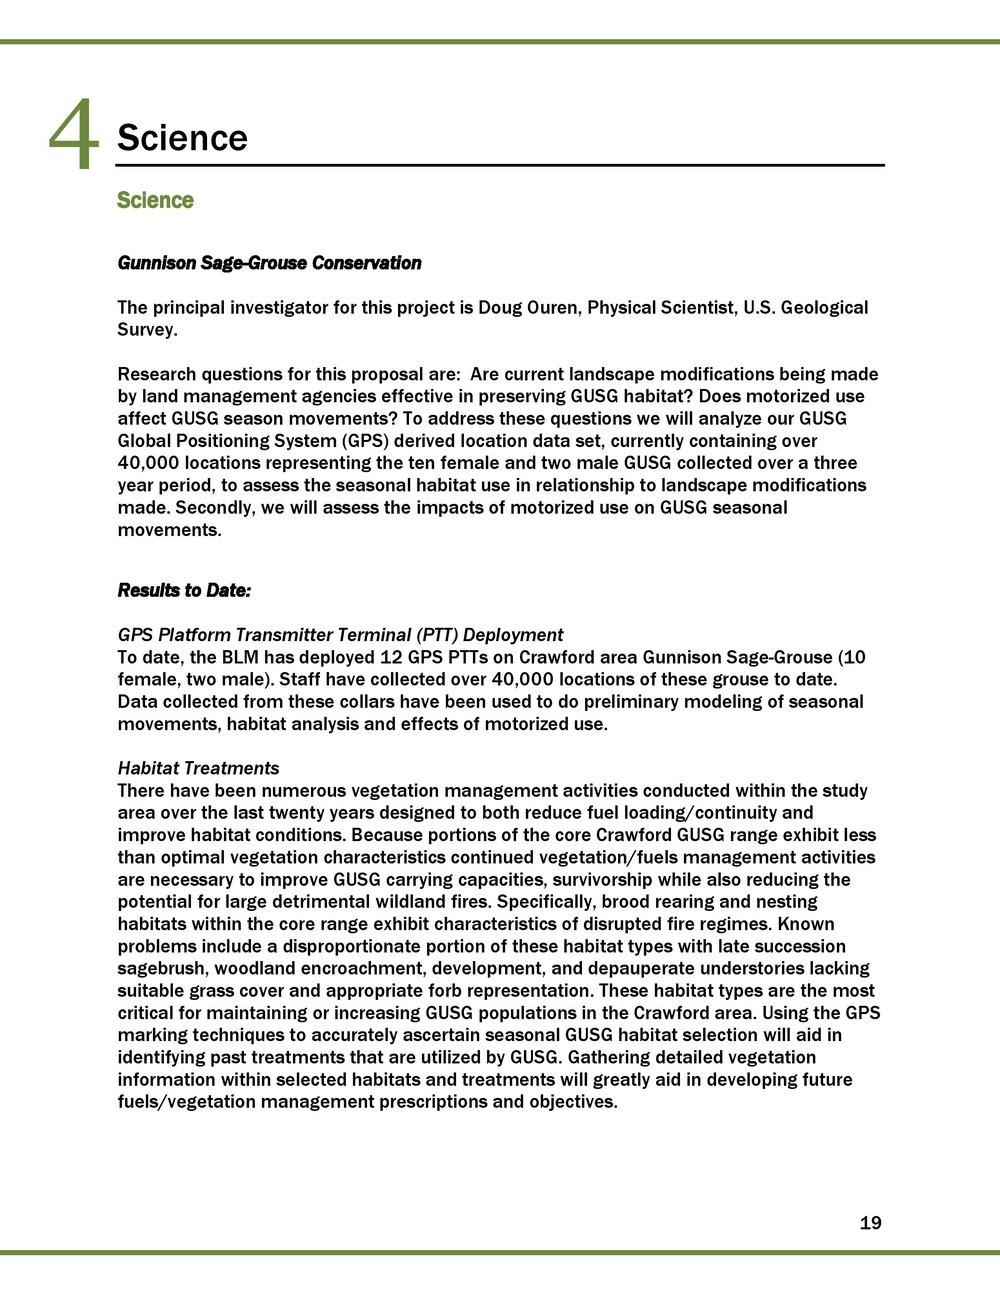 2016 FINAL GGNCA REPORT_2017_02_01-page-020.jpg